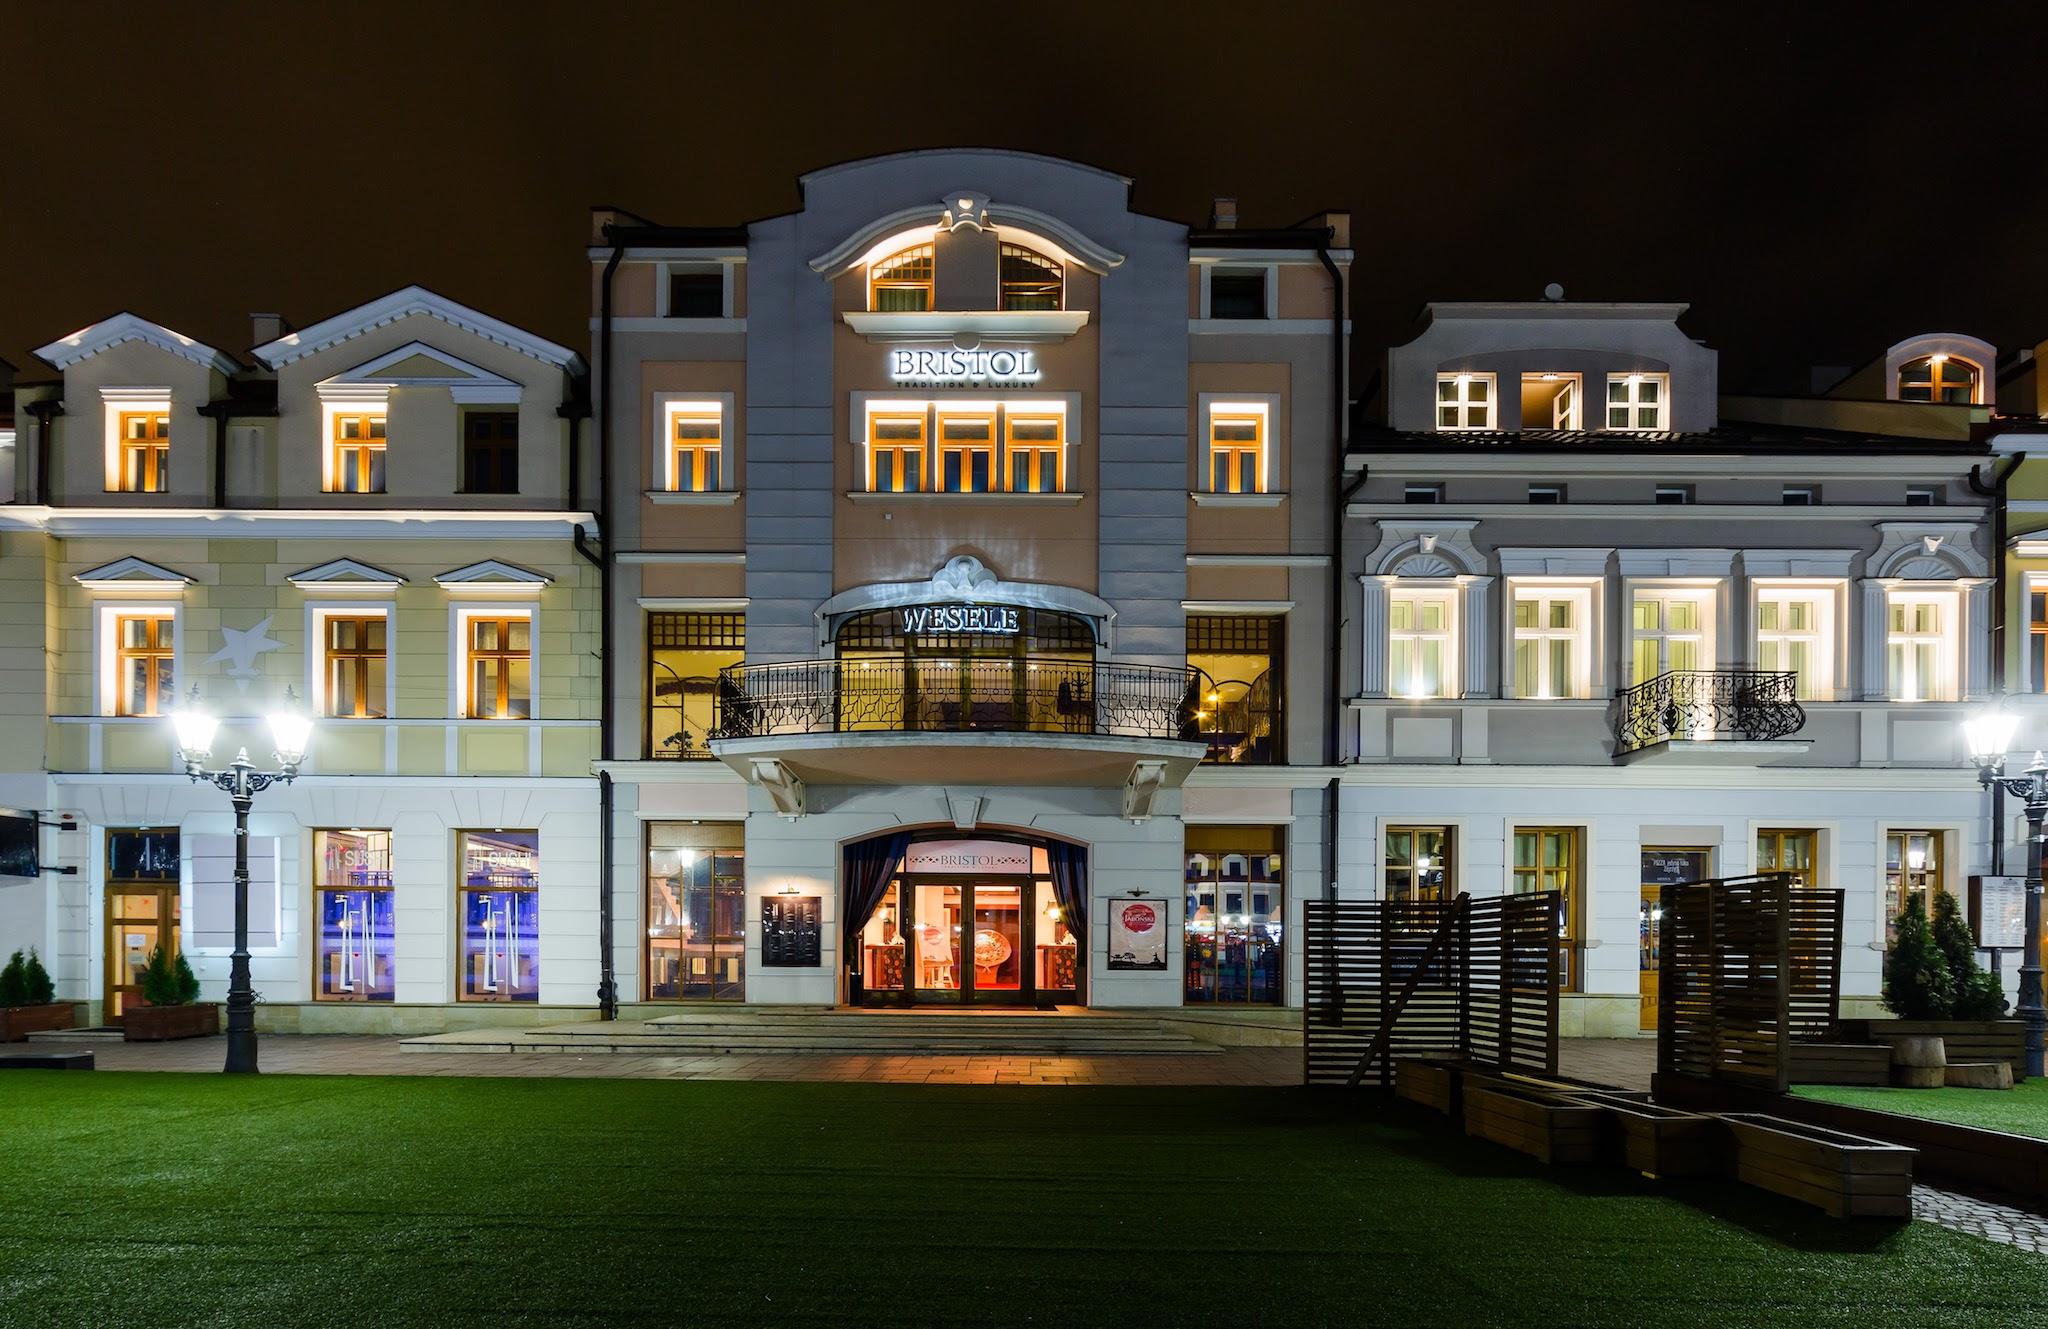 bristol-hotel-006